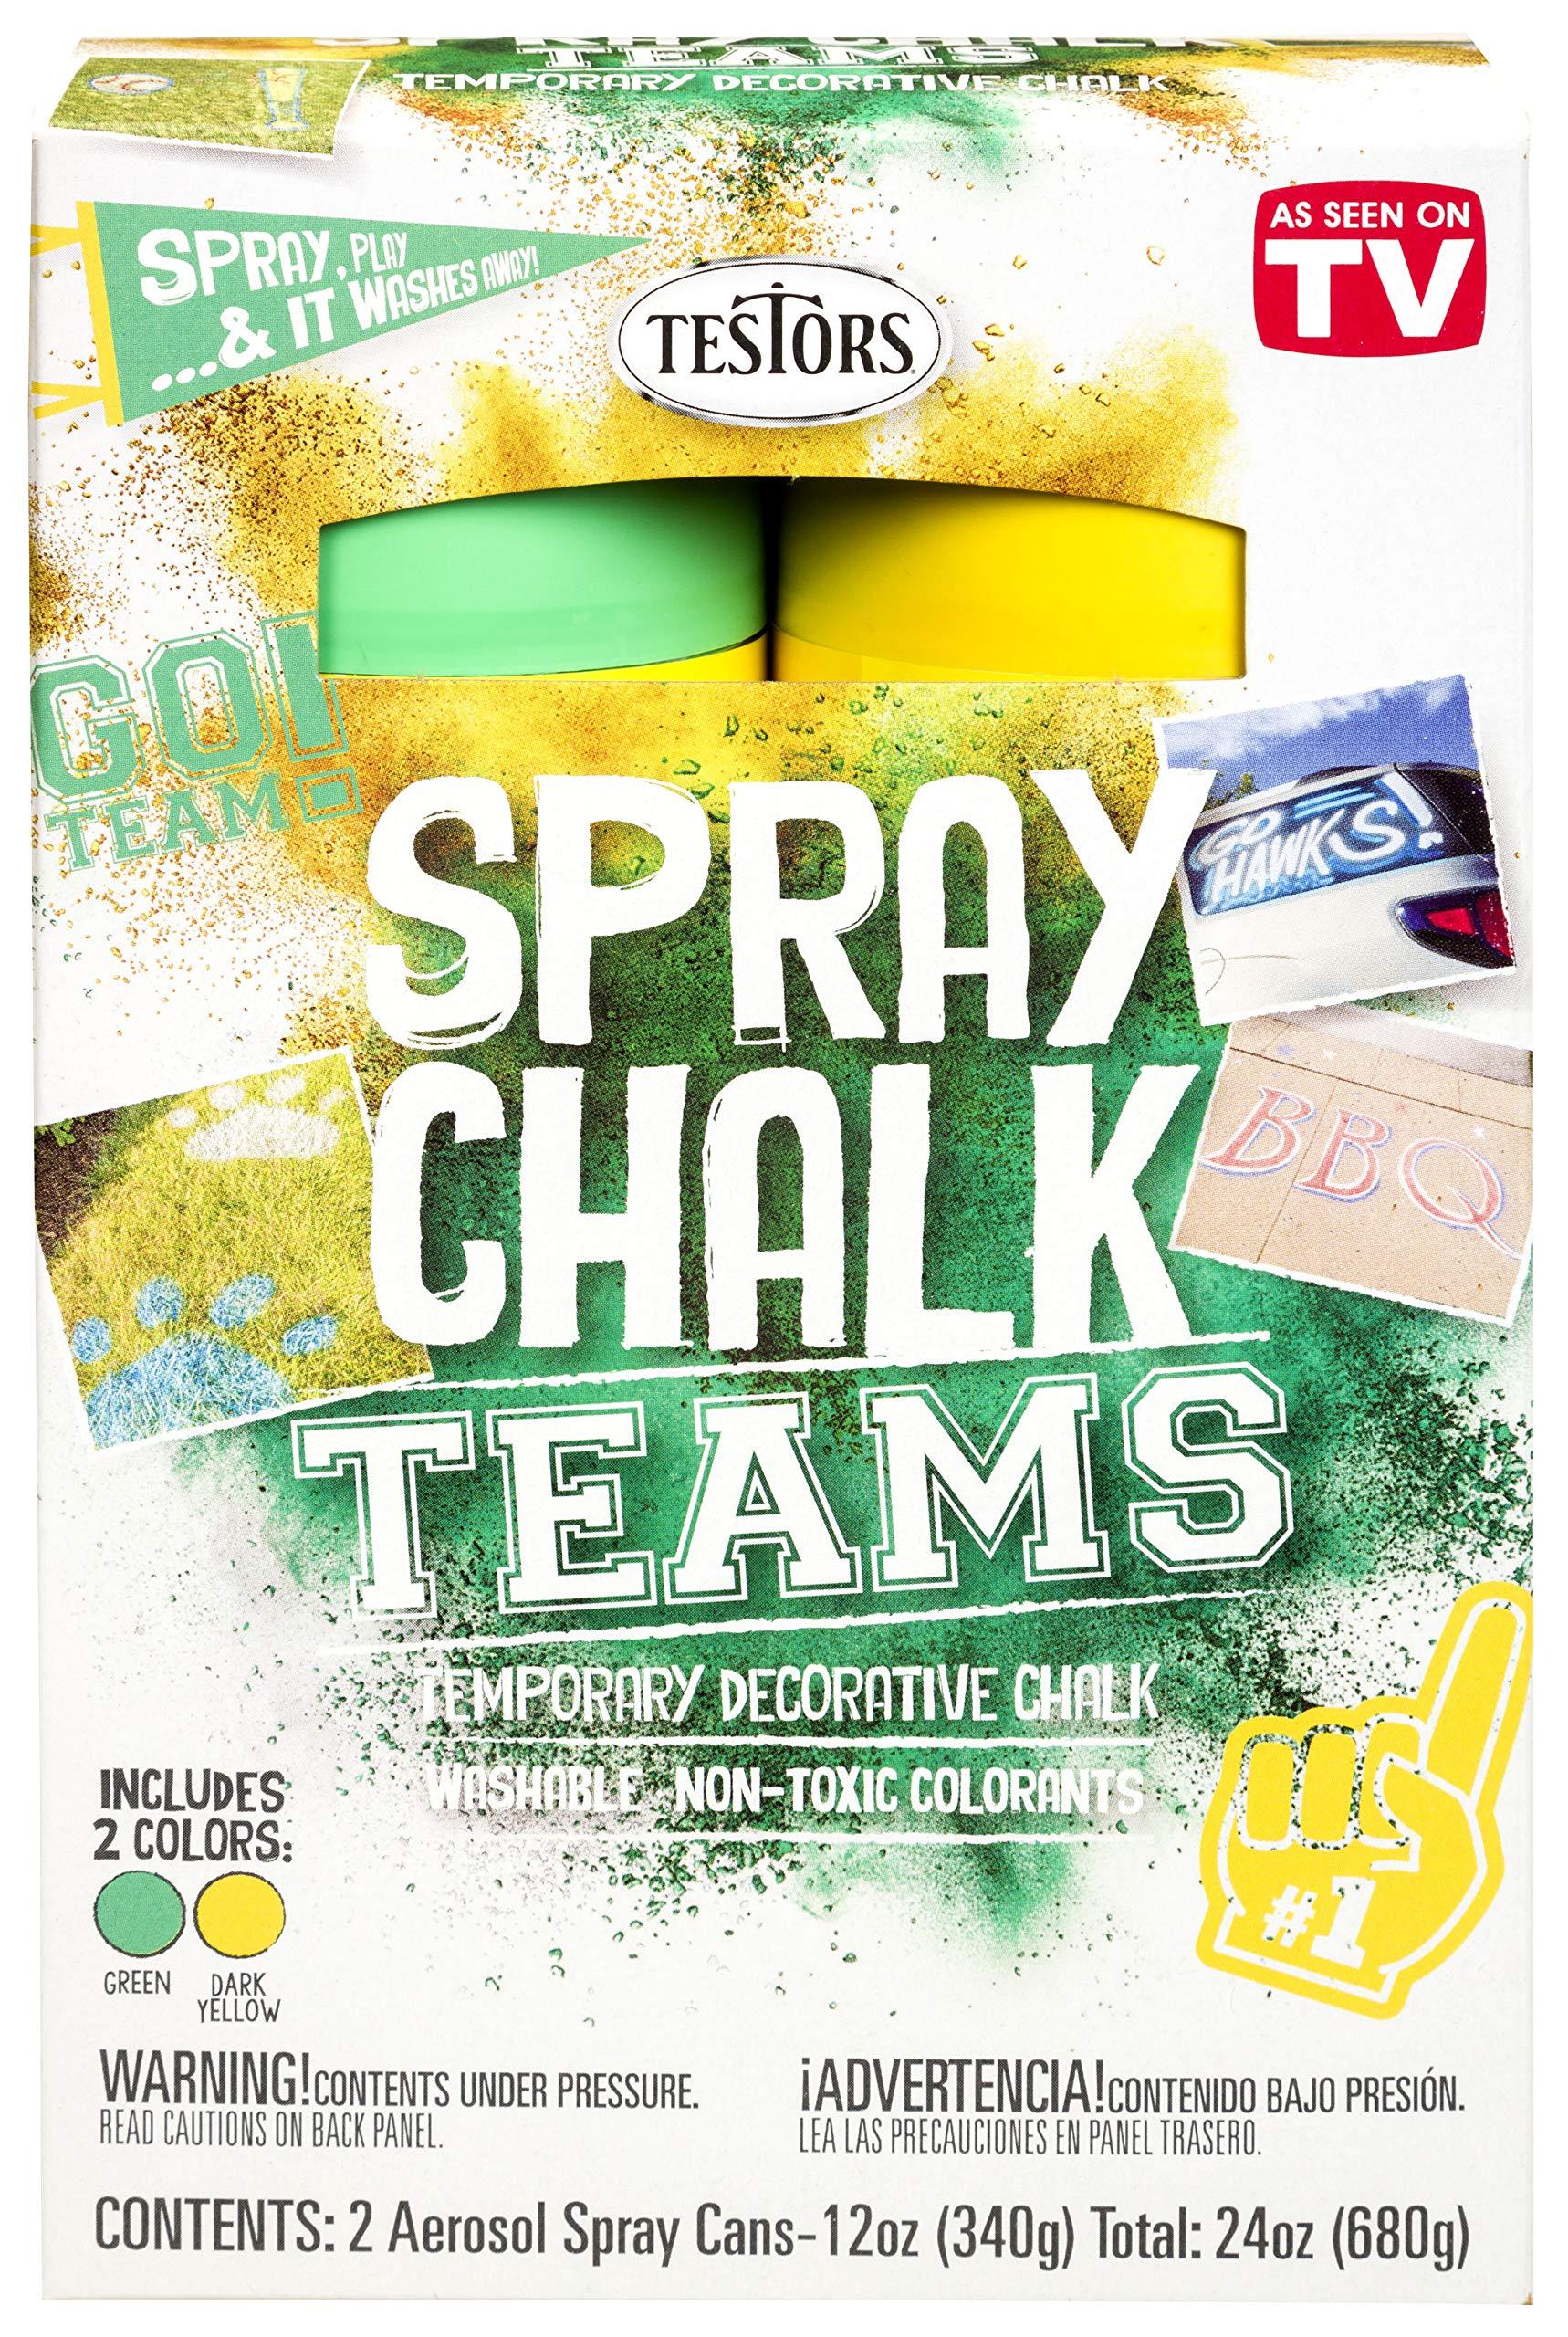 Testors 334335 Teams Spray Chalk, Green/Dark Yellow by Testors